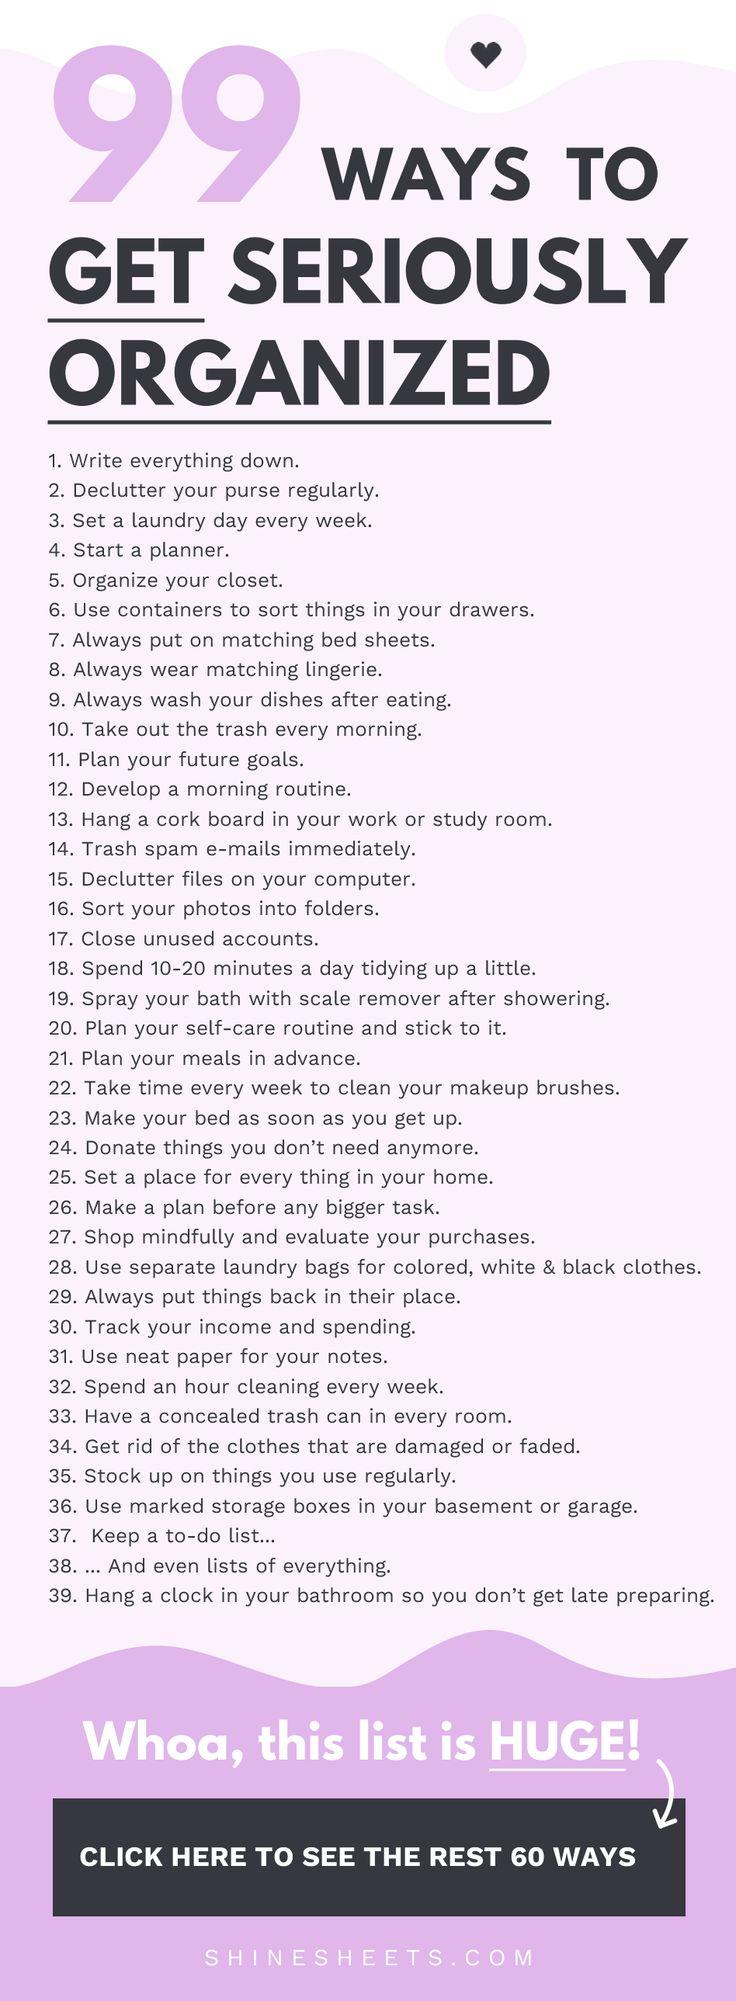 99 Ways To Get Seriously Organized